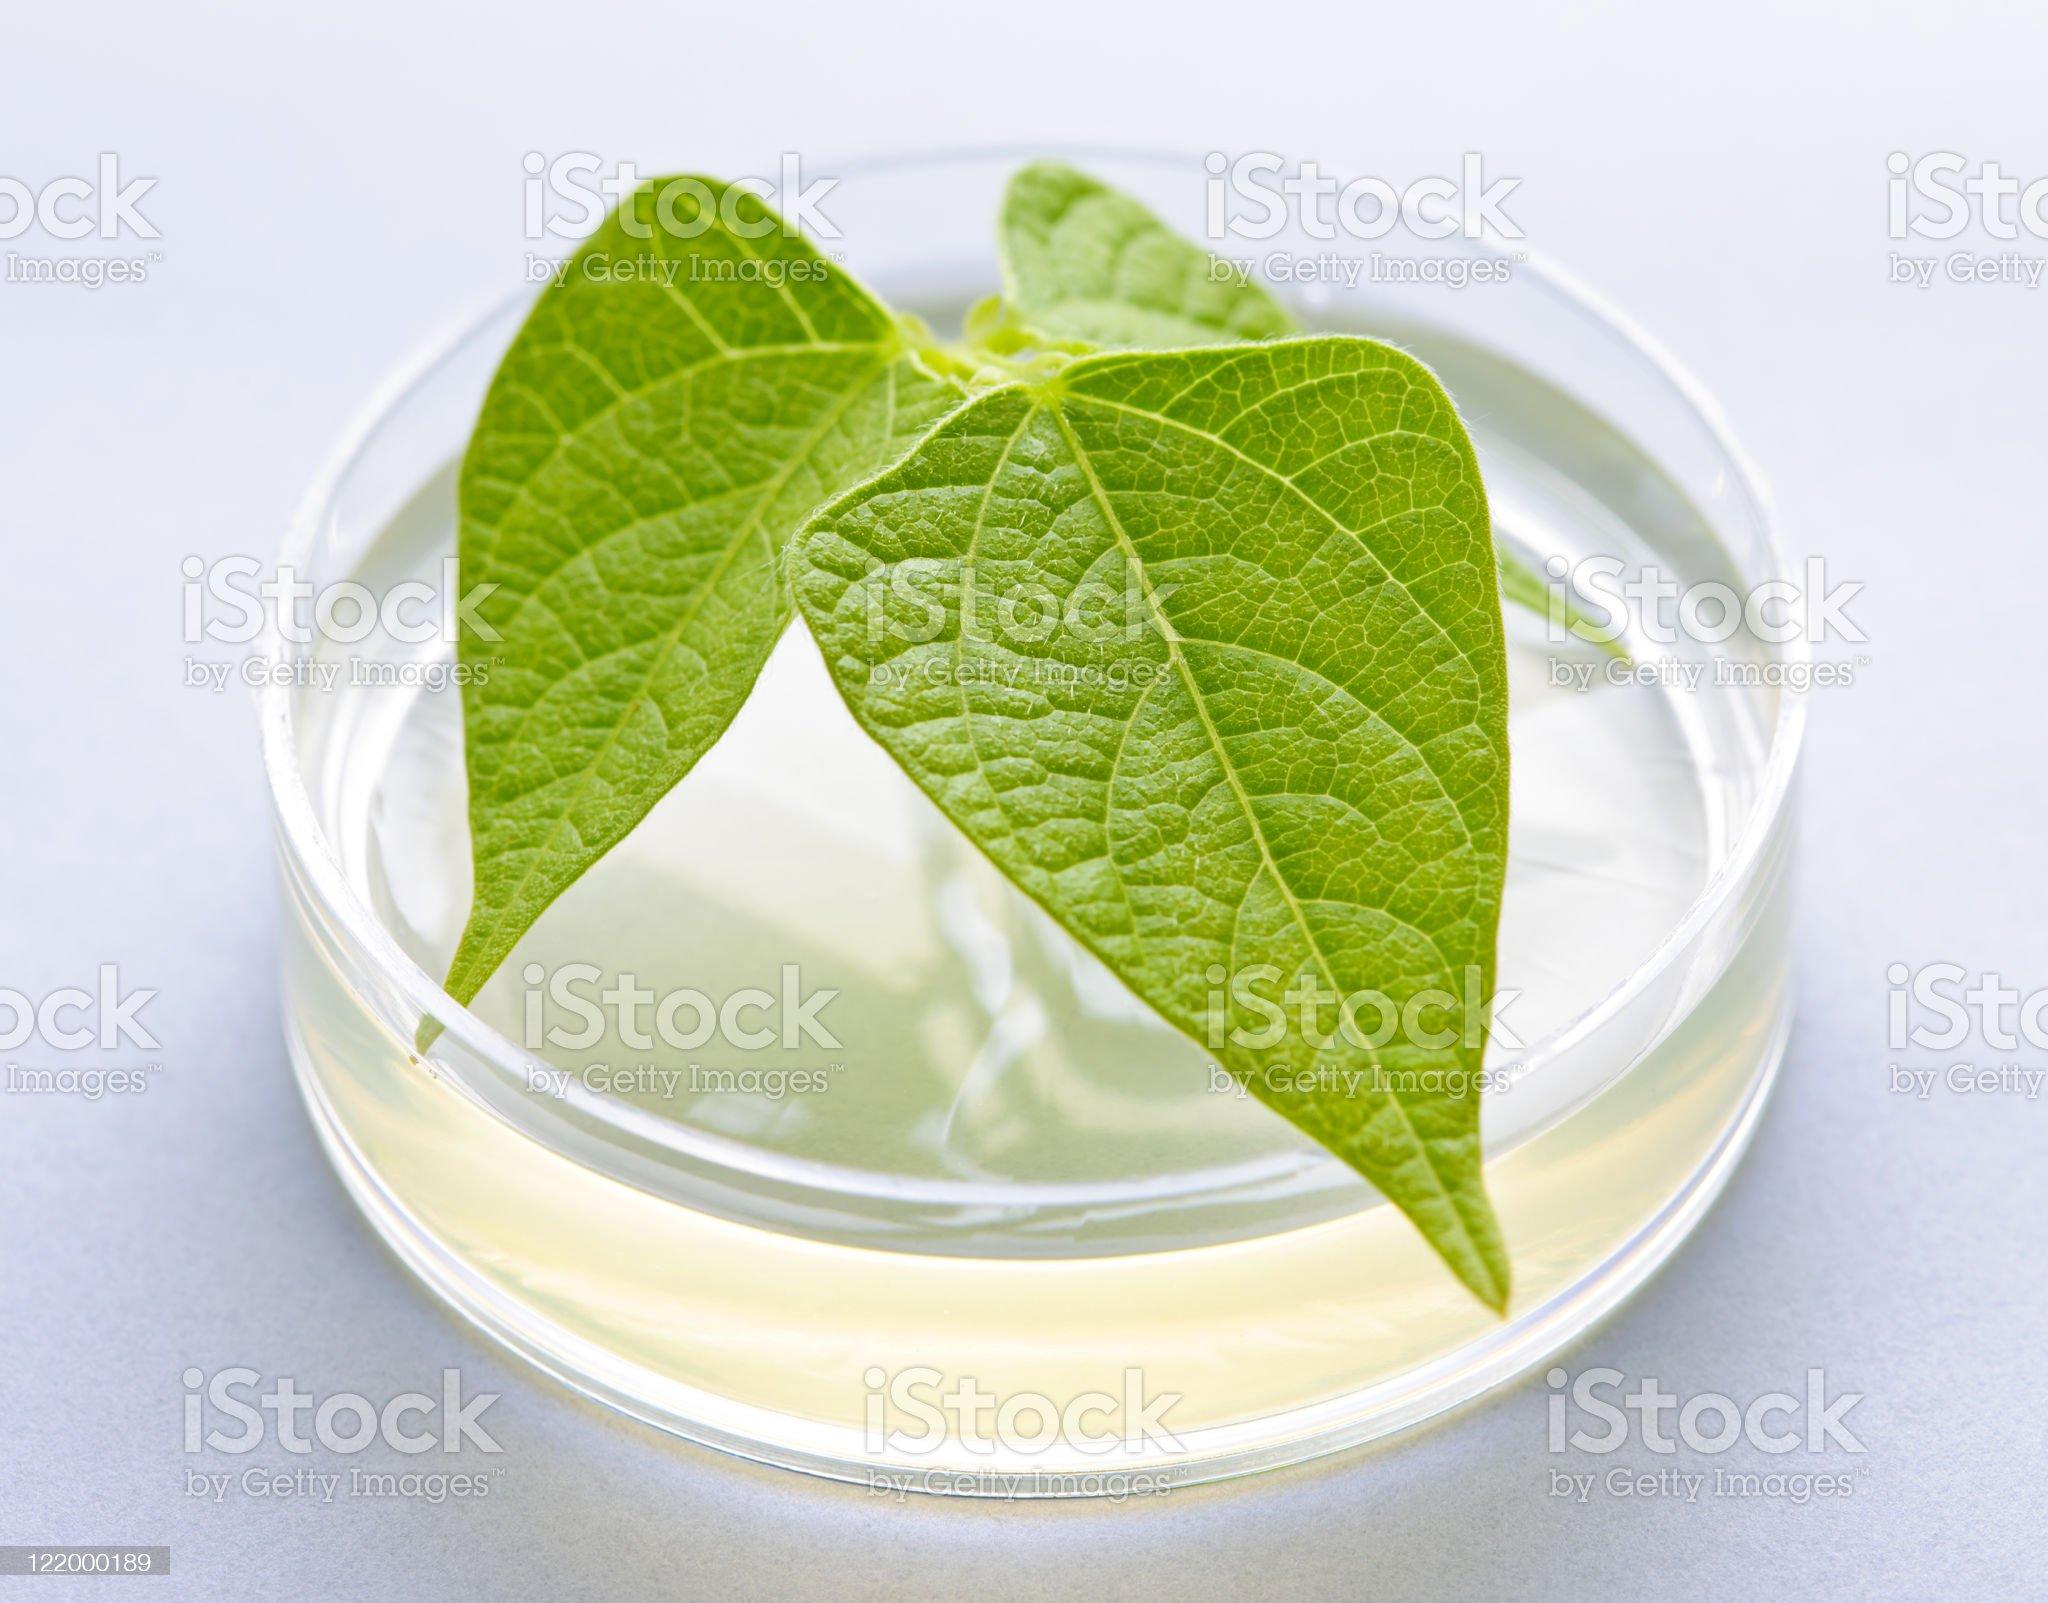 GM plant in petri dish royalty-free stock photo